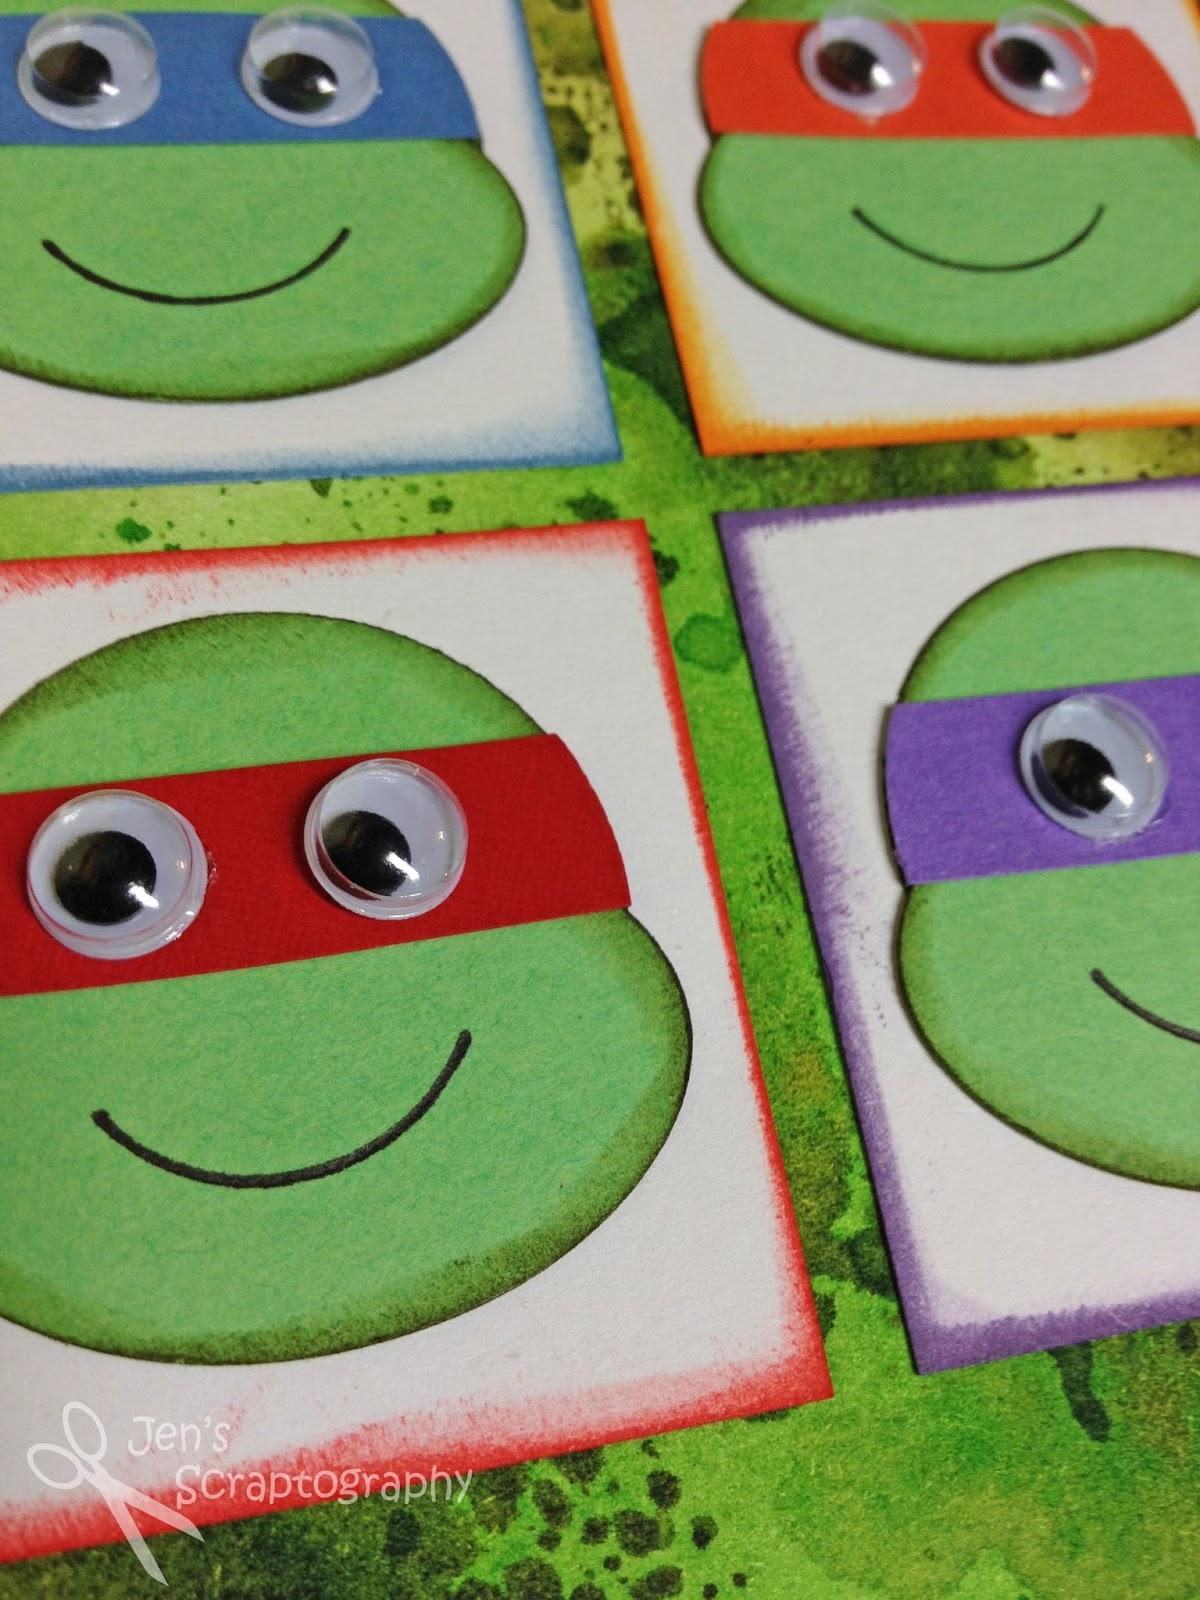 Jens Scraptography Teenage Mutant Ninja Turtle Birthday Card